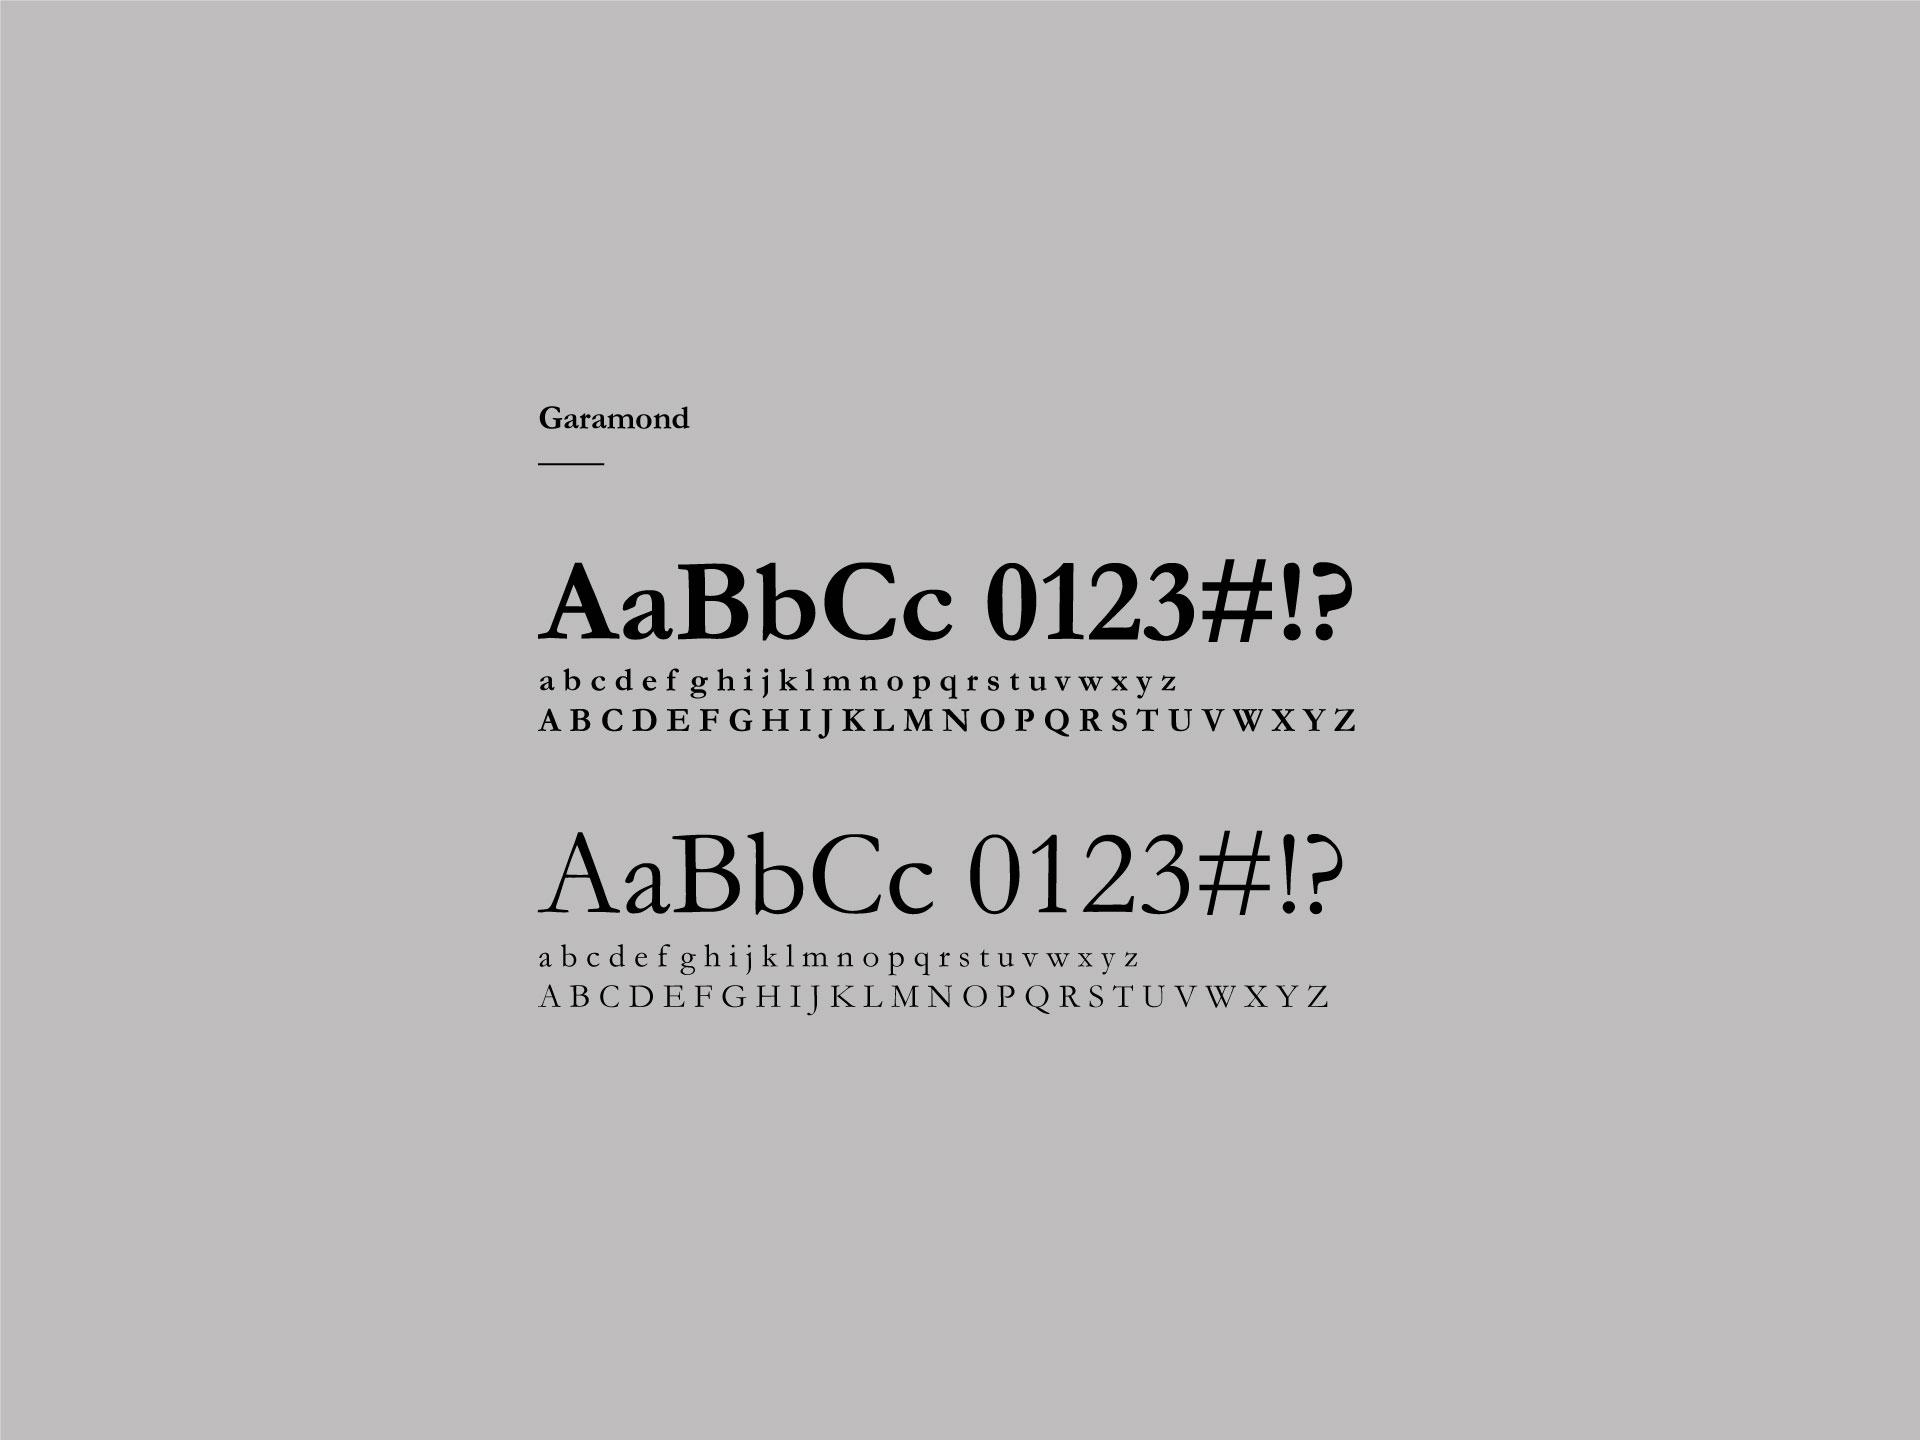 construction builder branding by Z Creative Studio Branding & Graphic Design Melbourne